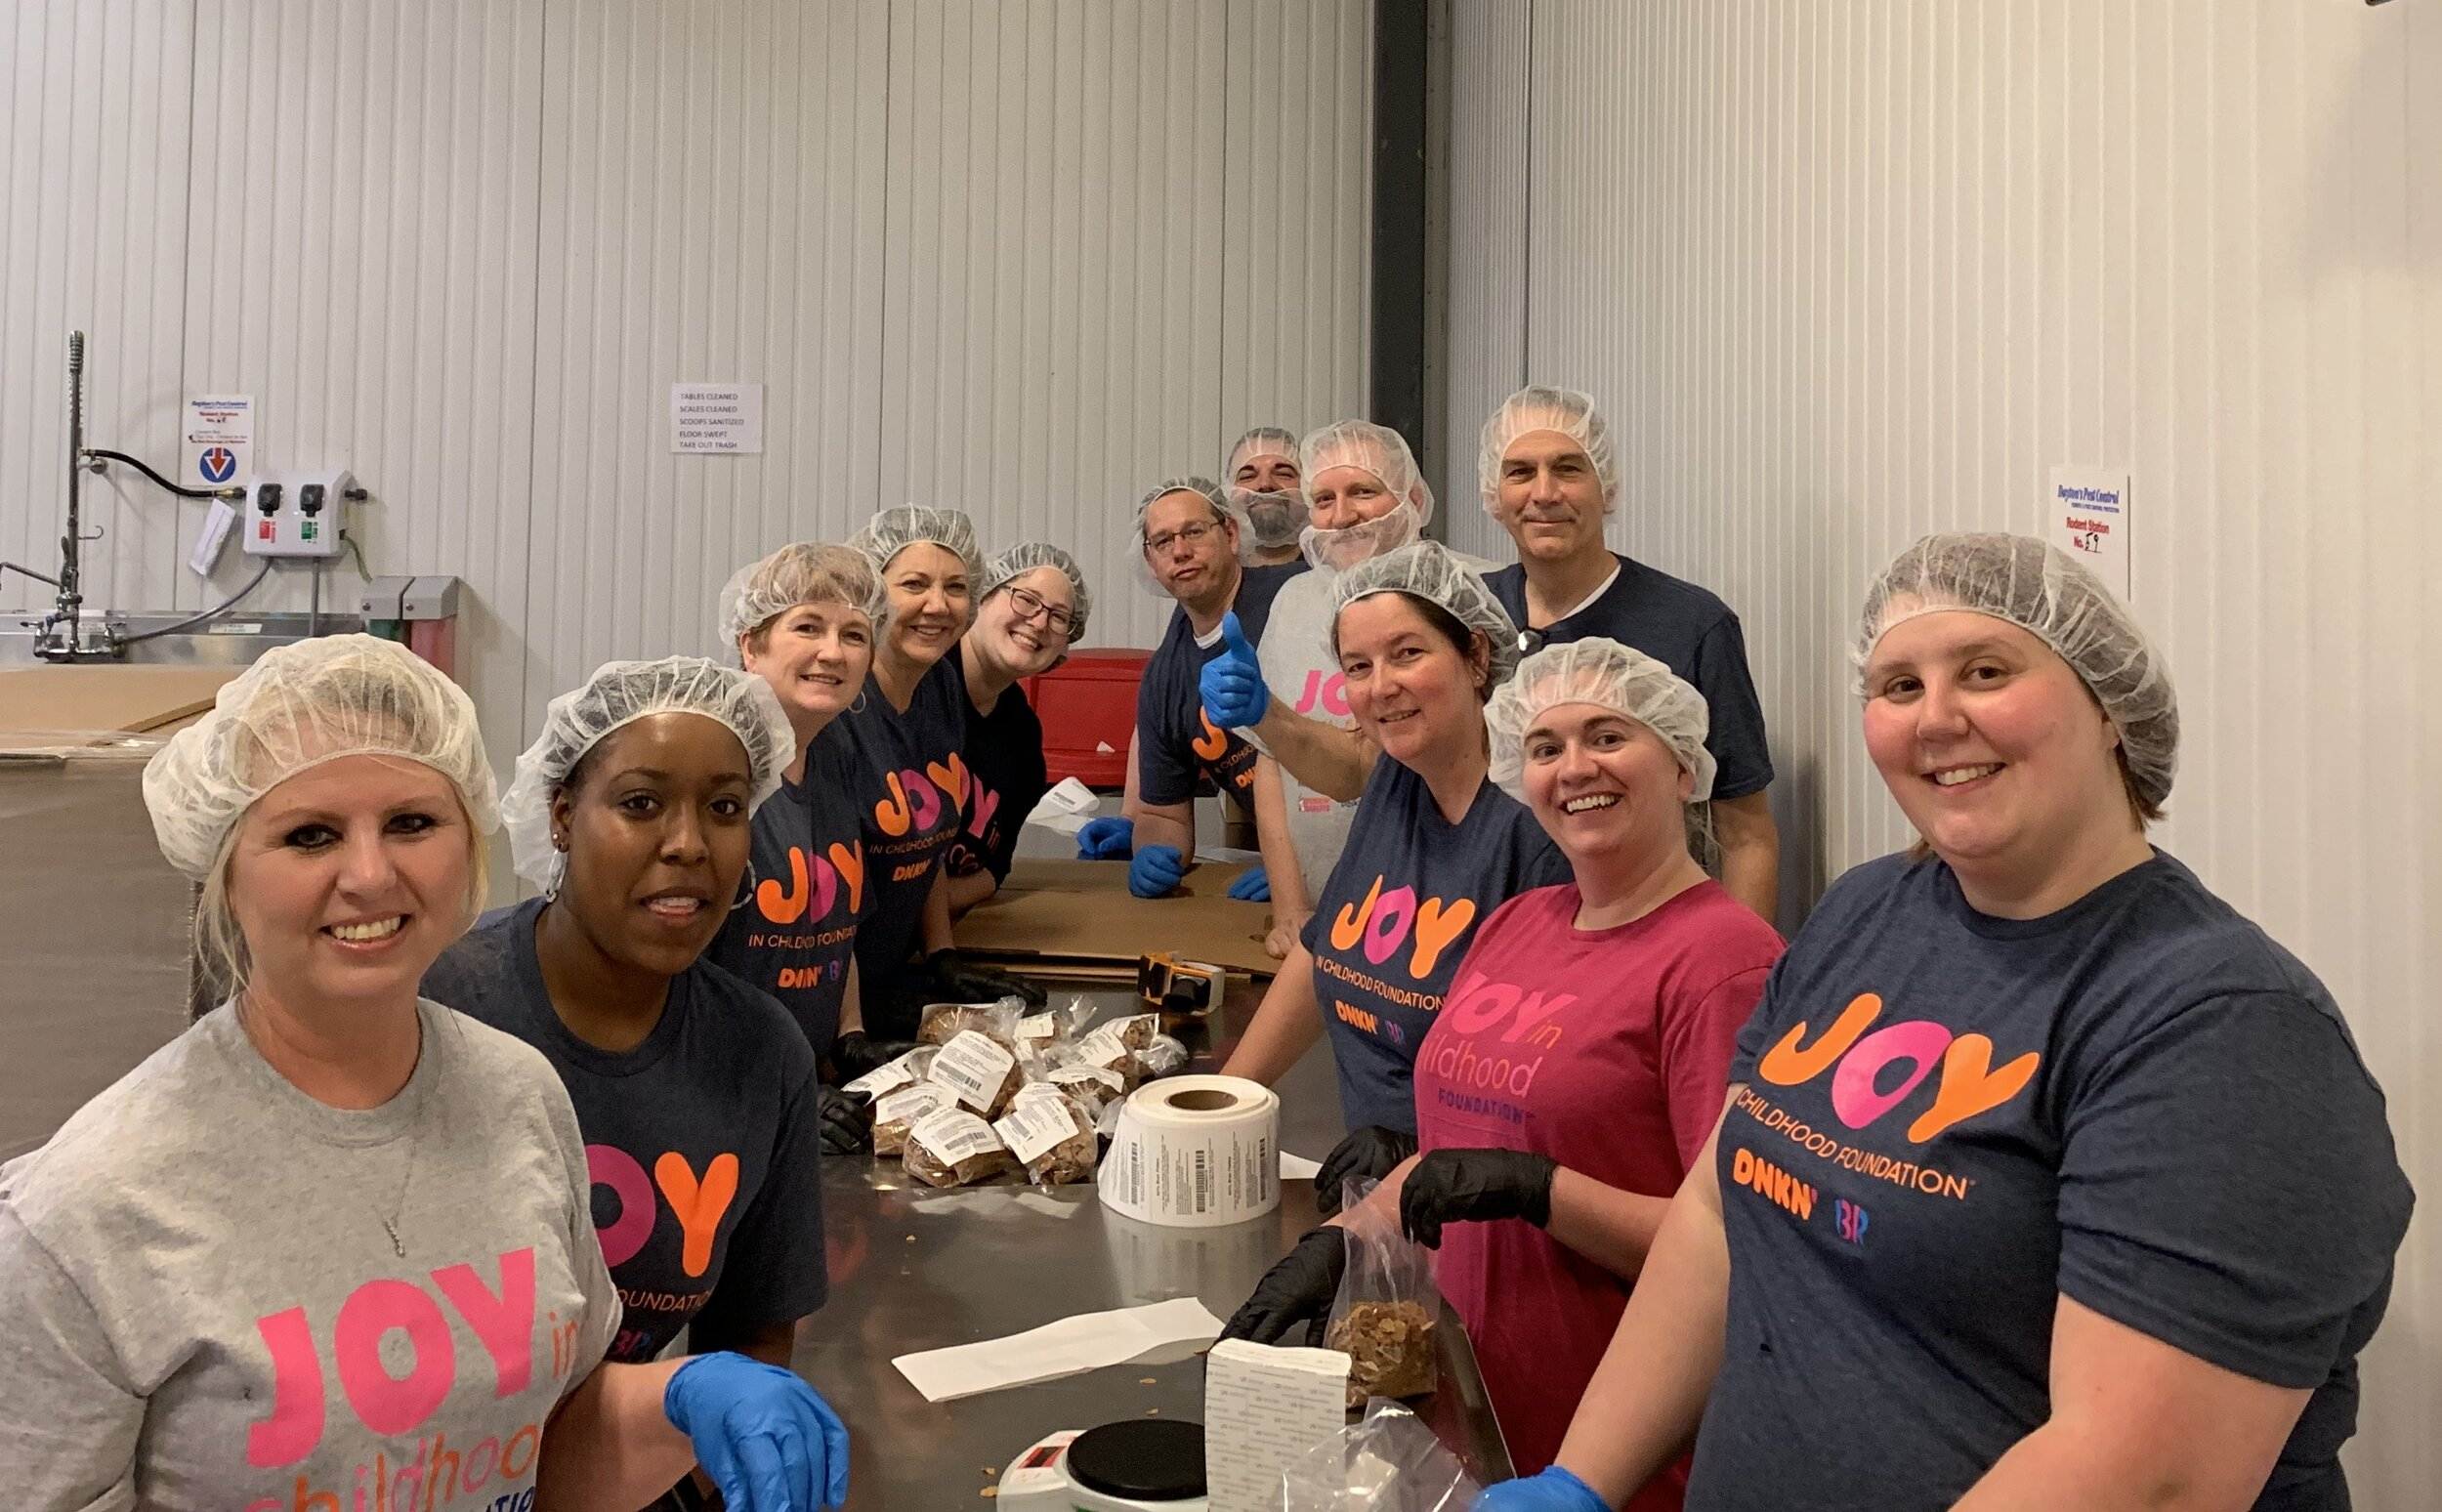 Bluemont leadership team volunteering at Maryville Second Harvest Food Bank